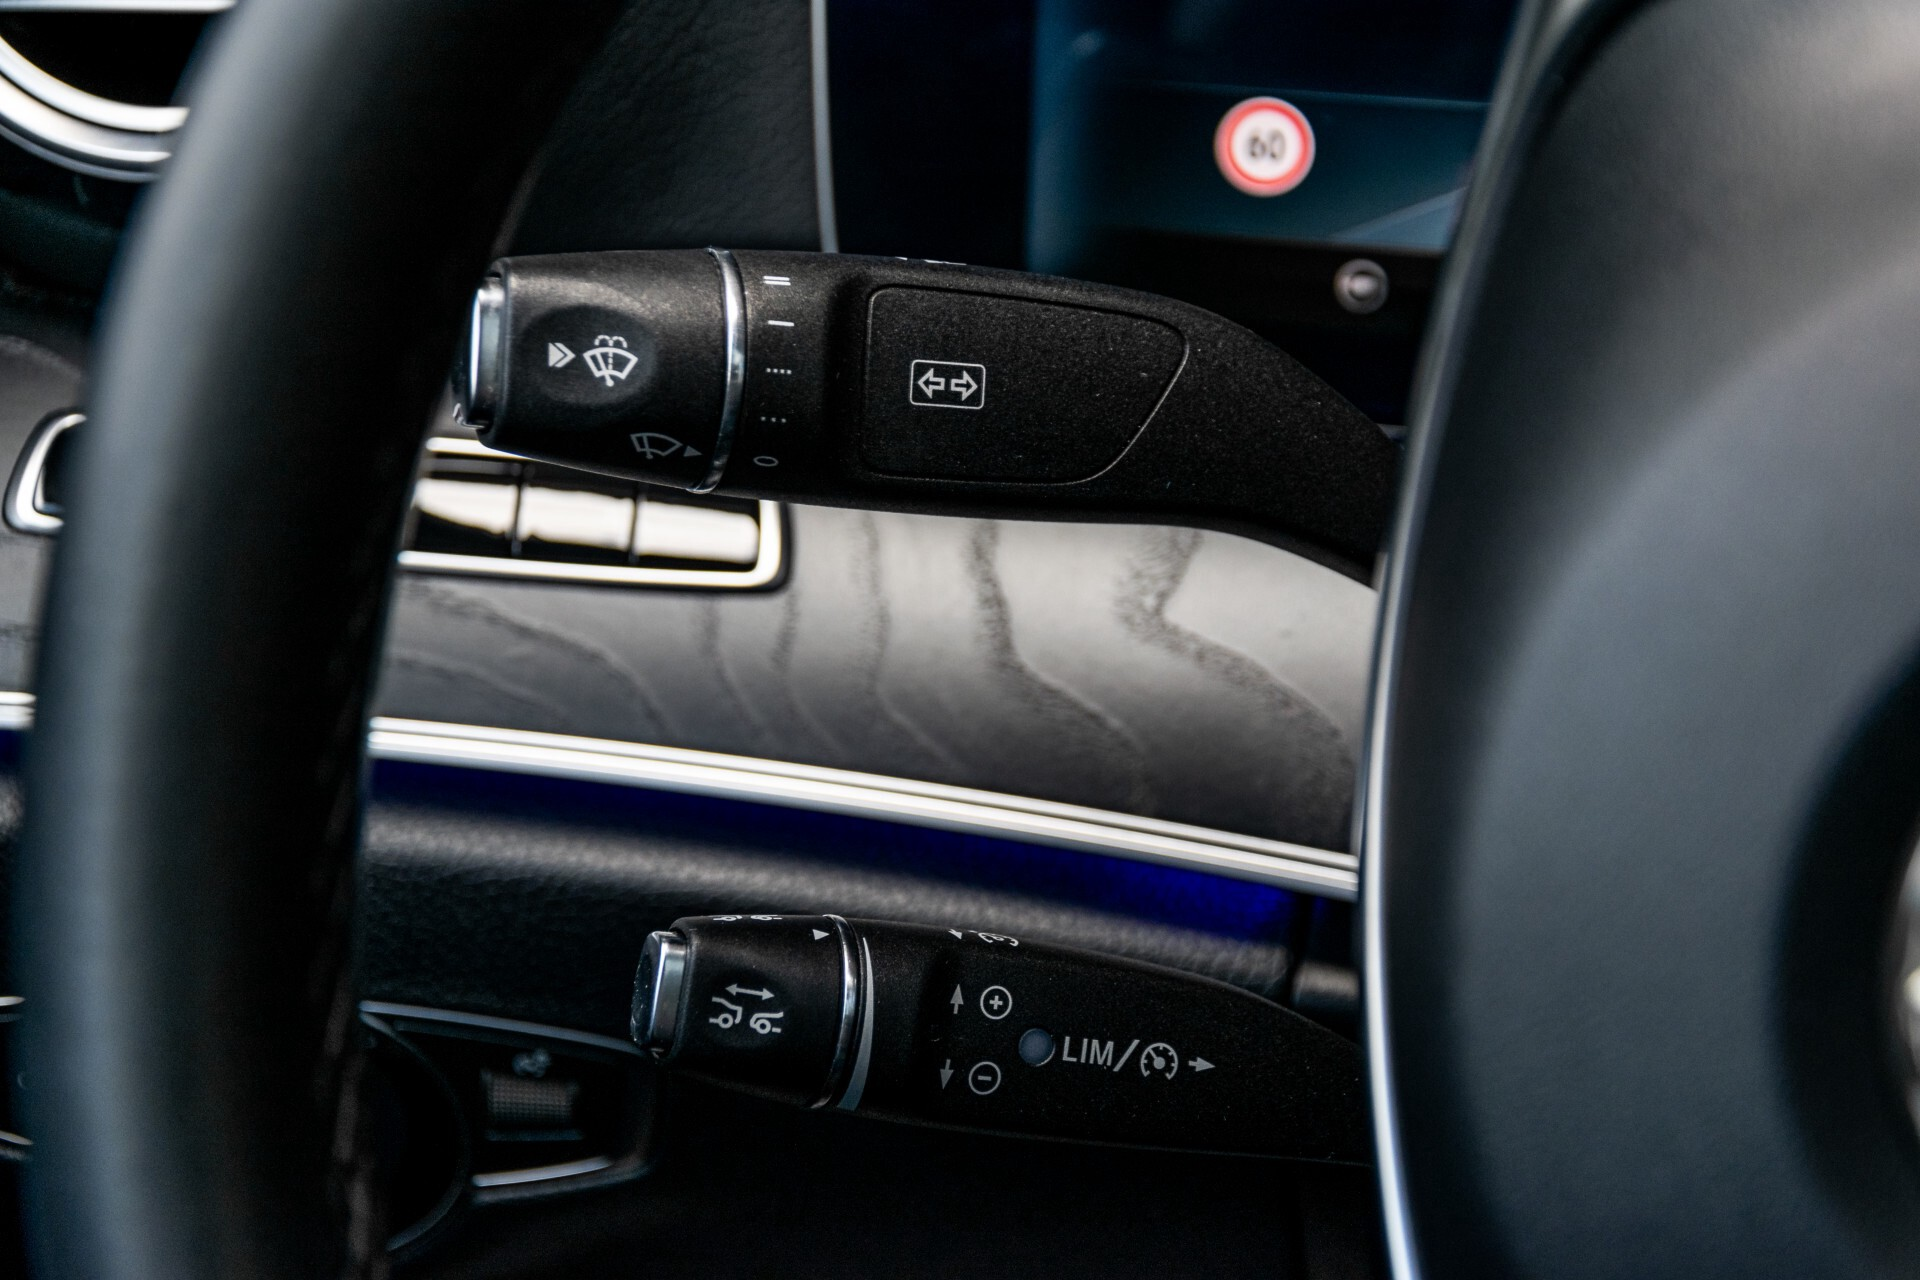 "Mercedes-Benz E-Klasse 220 d AMG Night Panorama/Widescreen/Burmester/20""/Wegklapbare trekhaak Aut9 Foto 10"